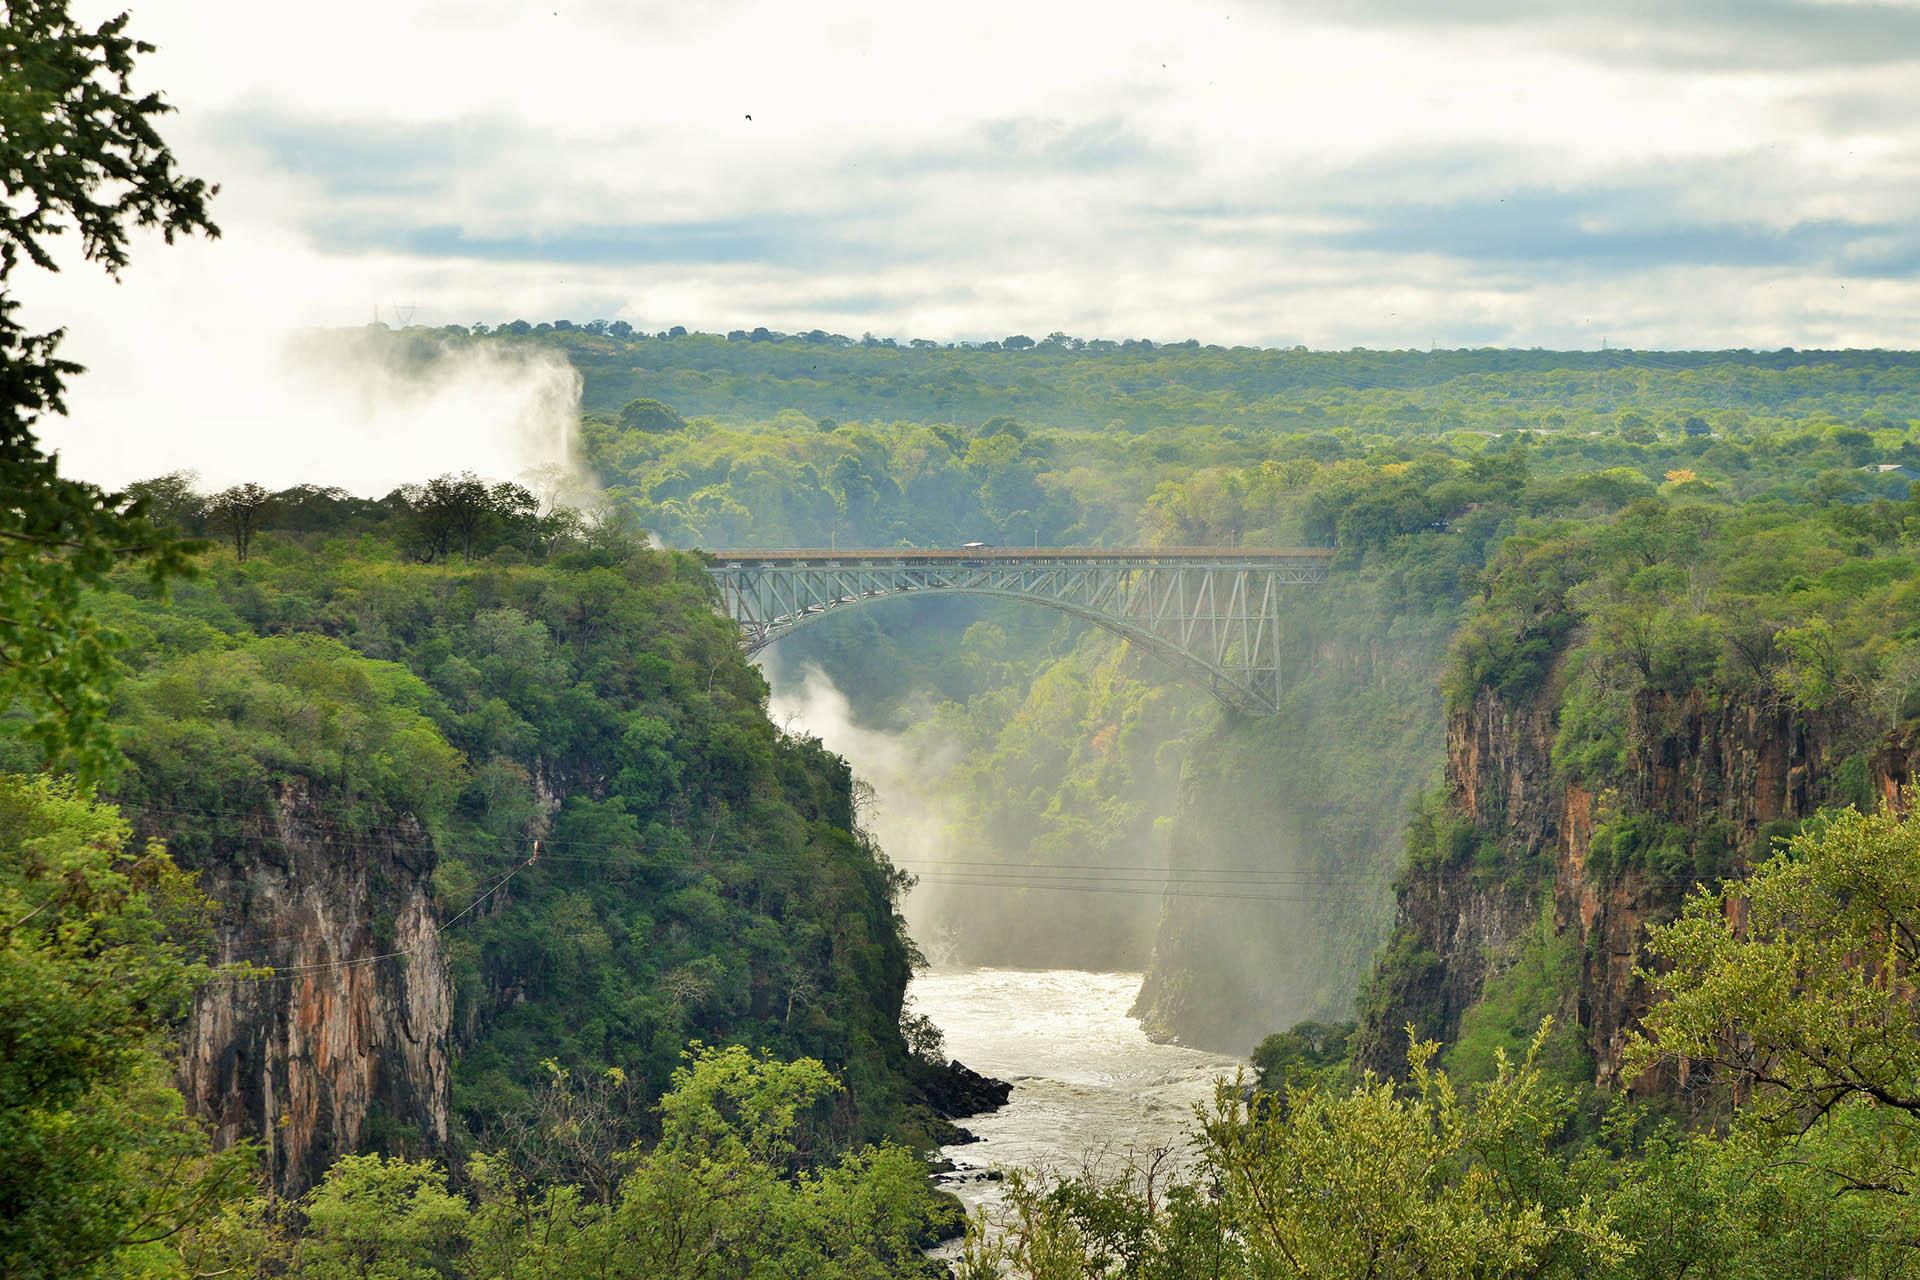 lower zambezi national park tours-victoria-falls-lake-malawi-zambia-malawian-style-malawi-adventures-experiences-specialist-tour-operator-vic-falls-view